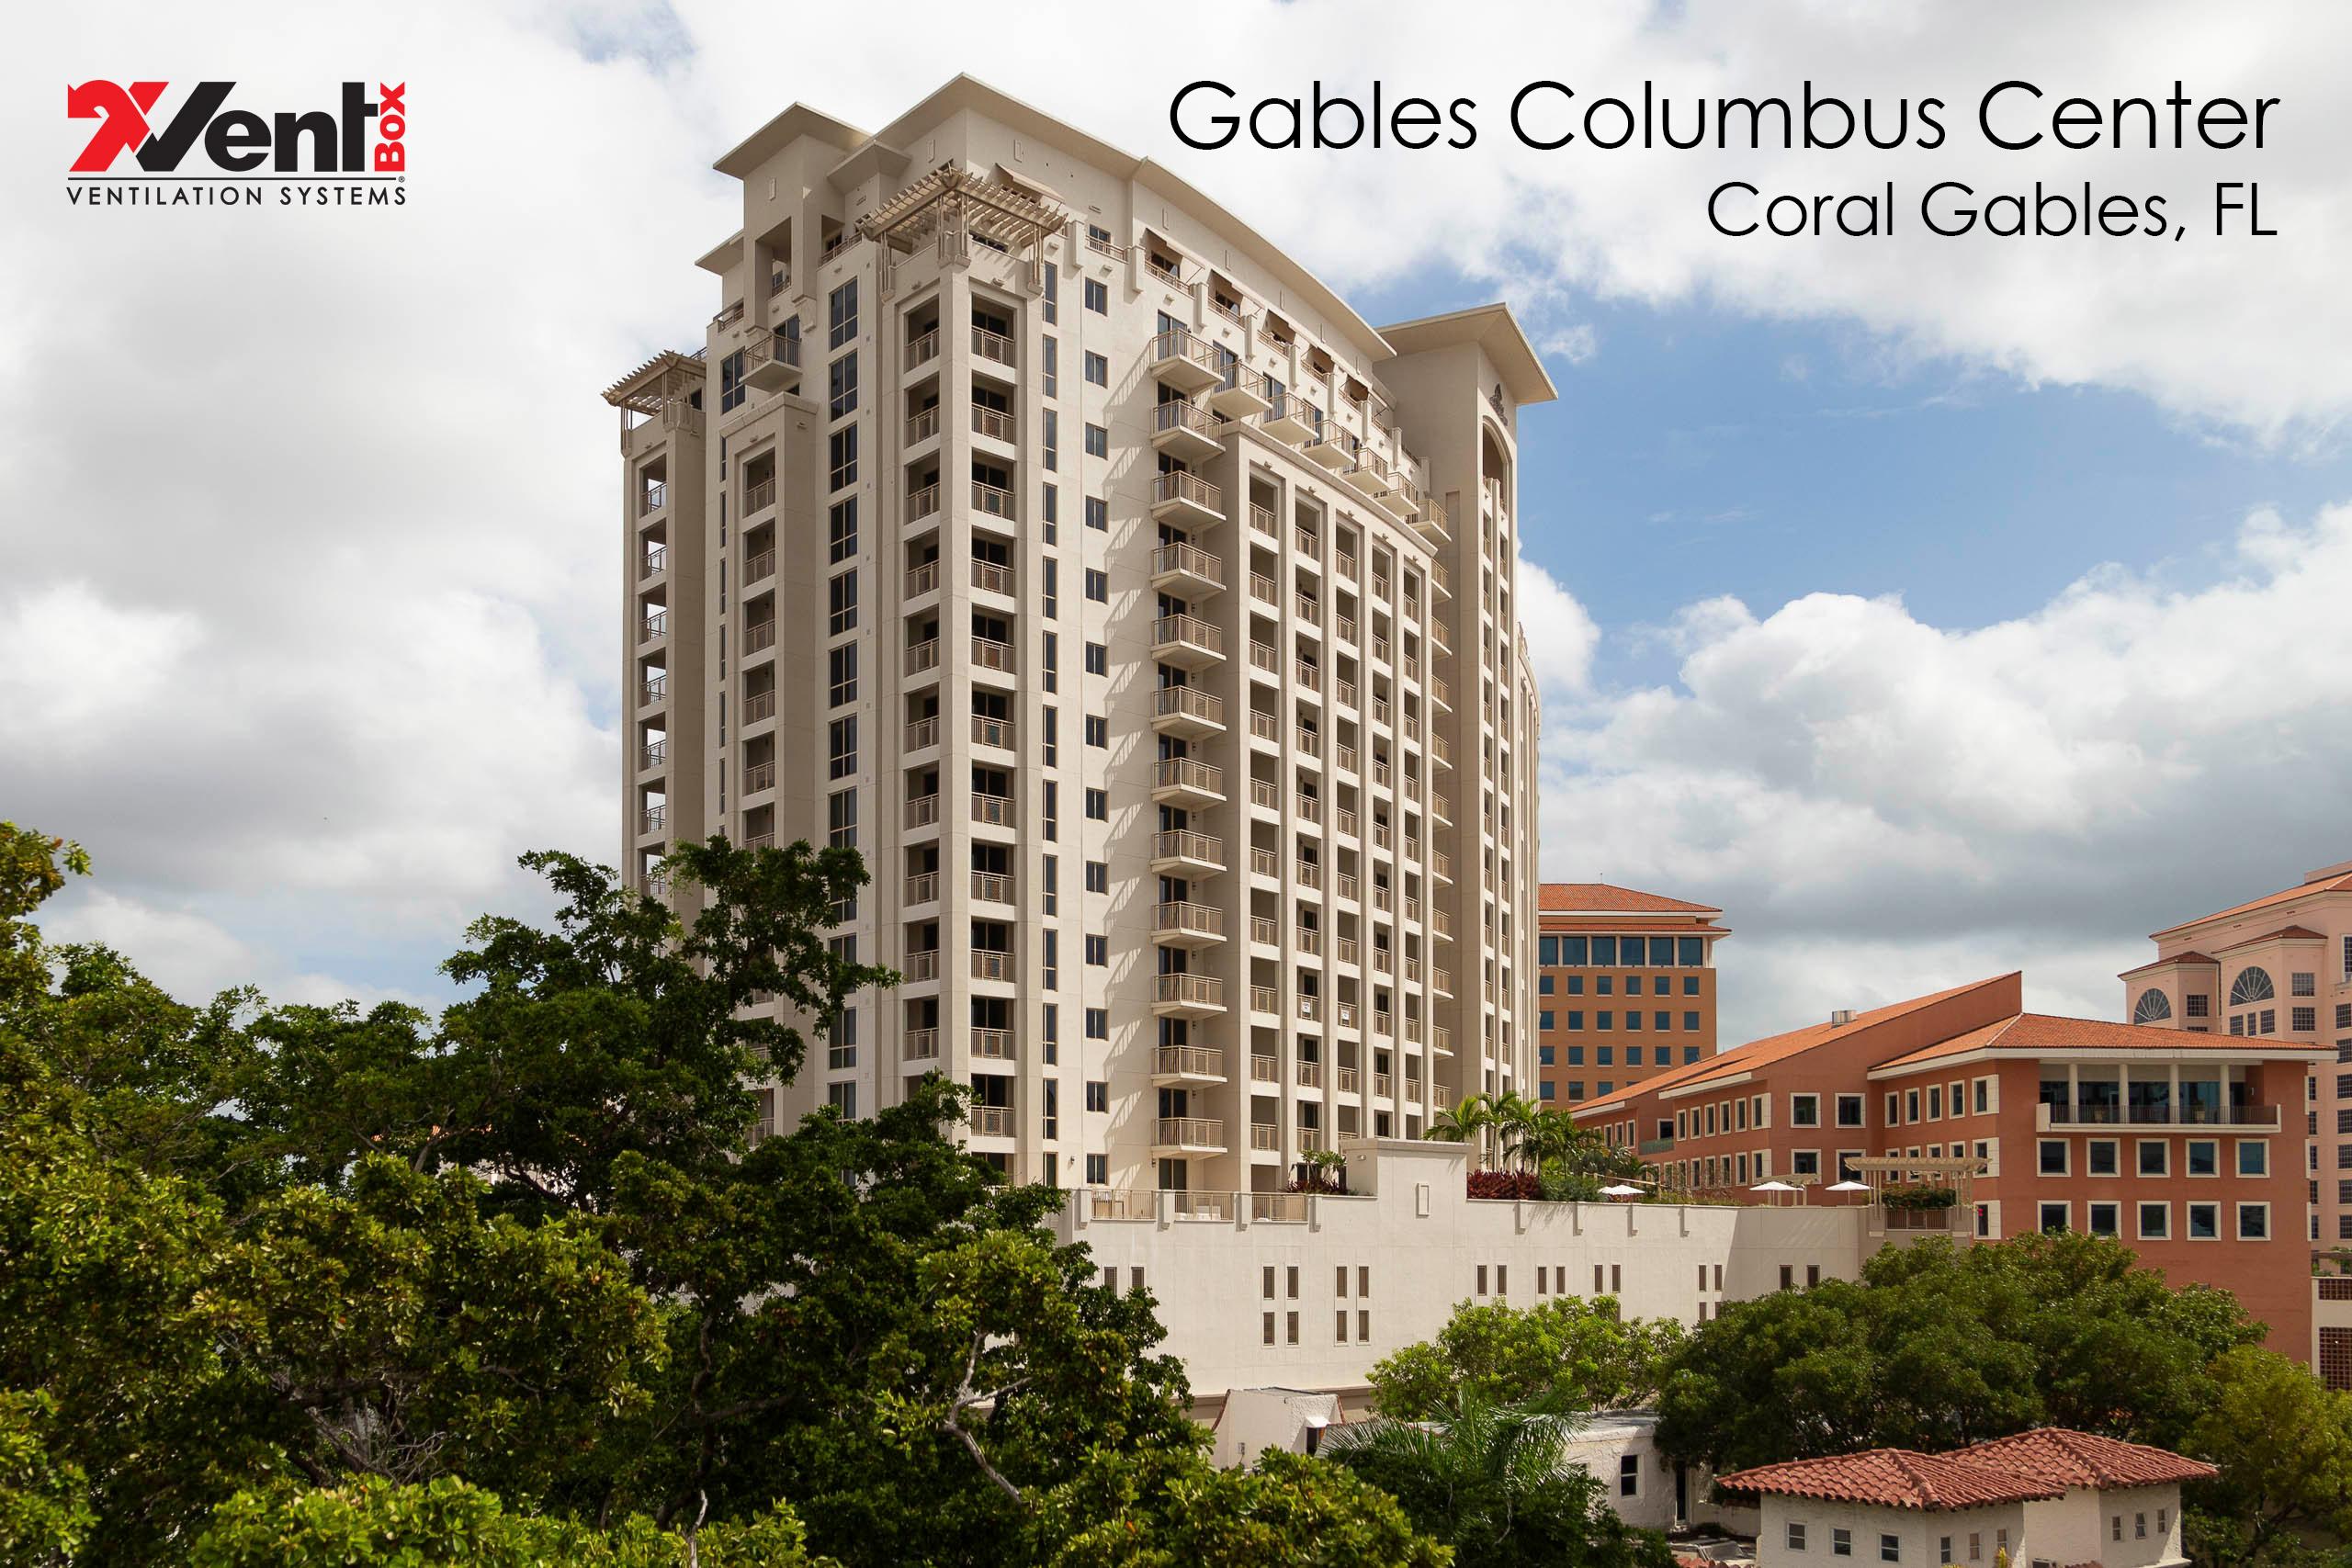 Gables Columbus Center